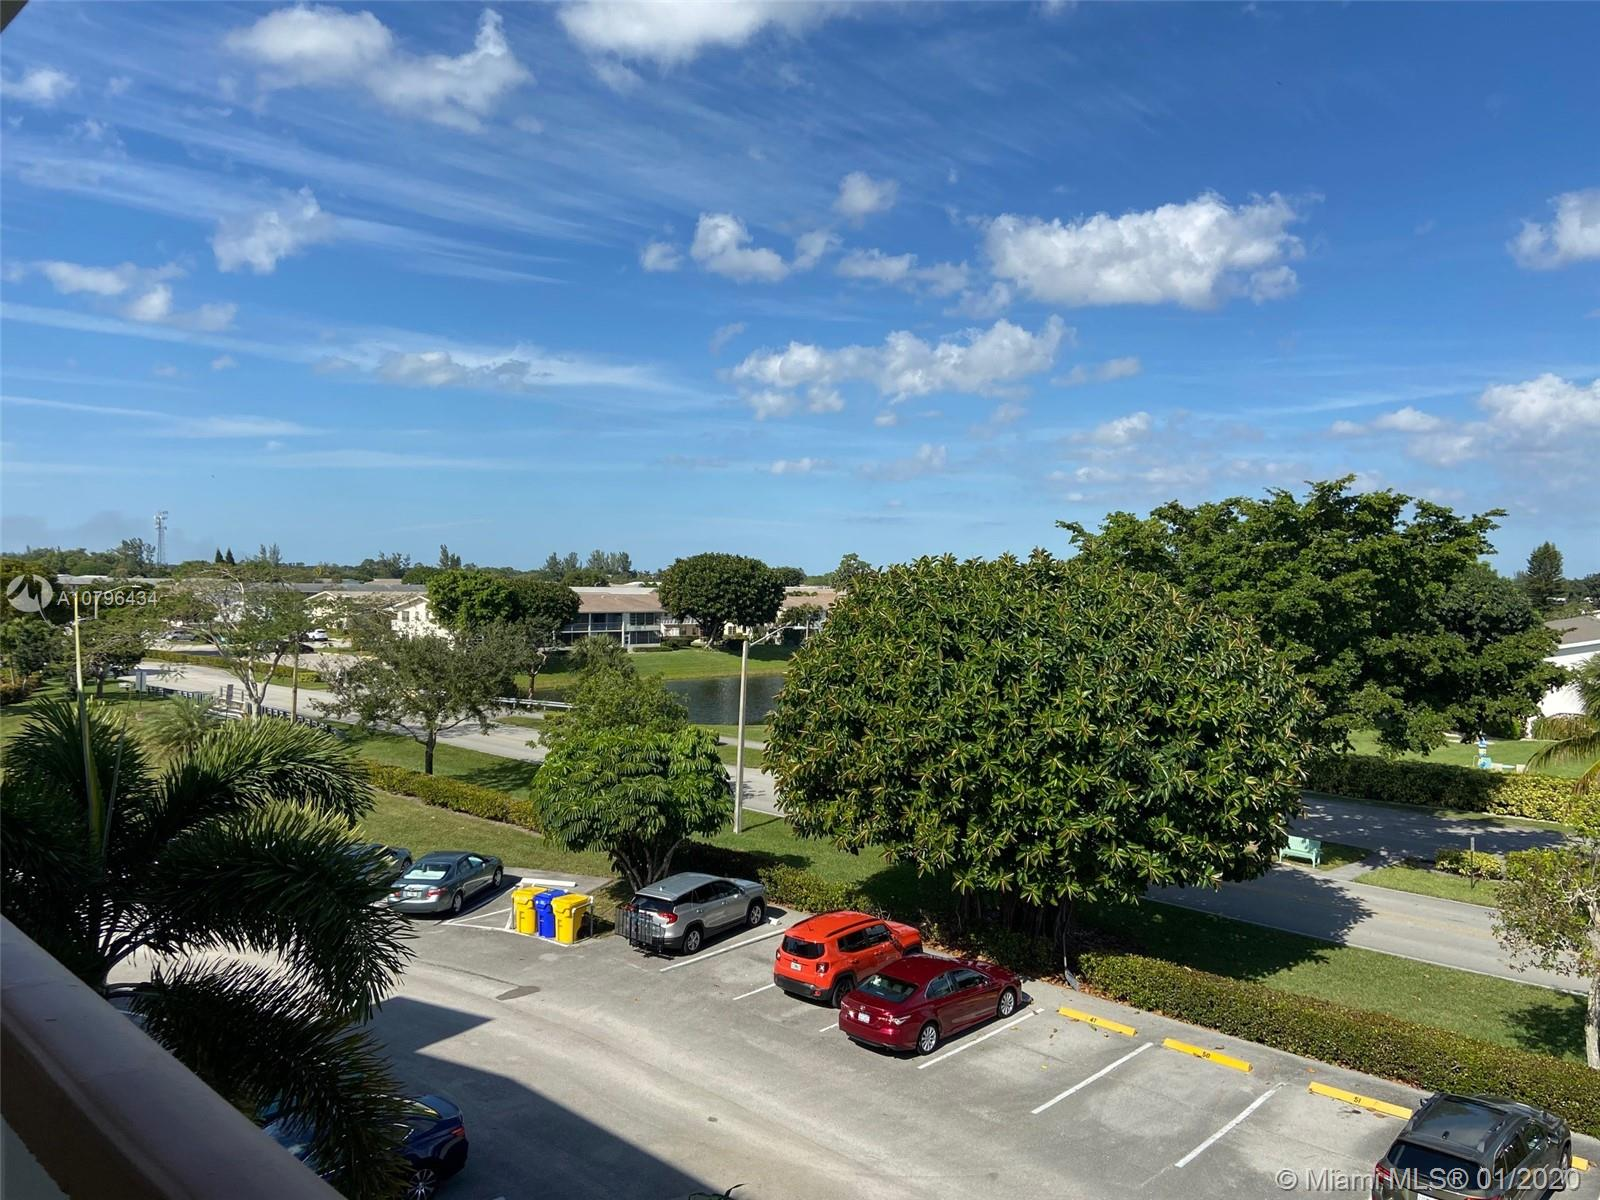 427 Wellington G 427, West Palm Beach, FL 33417